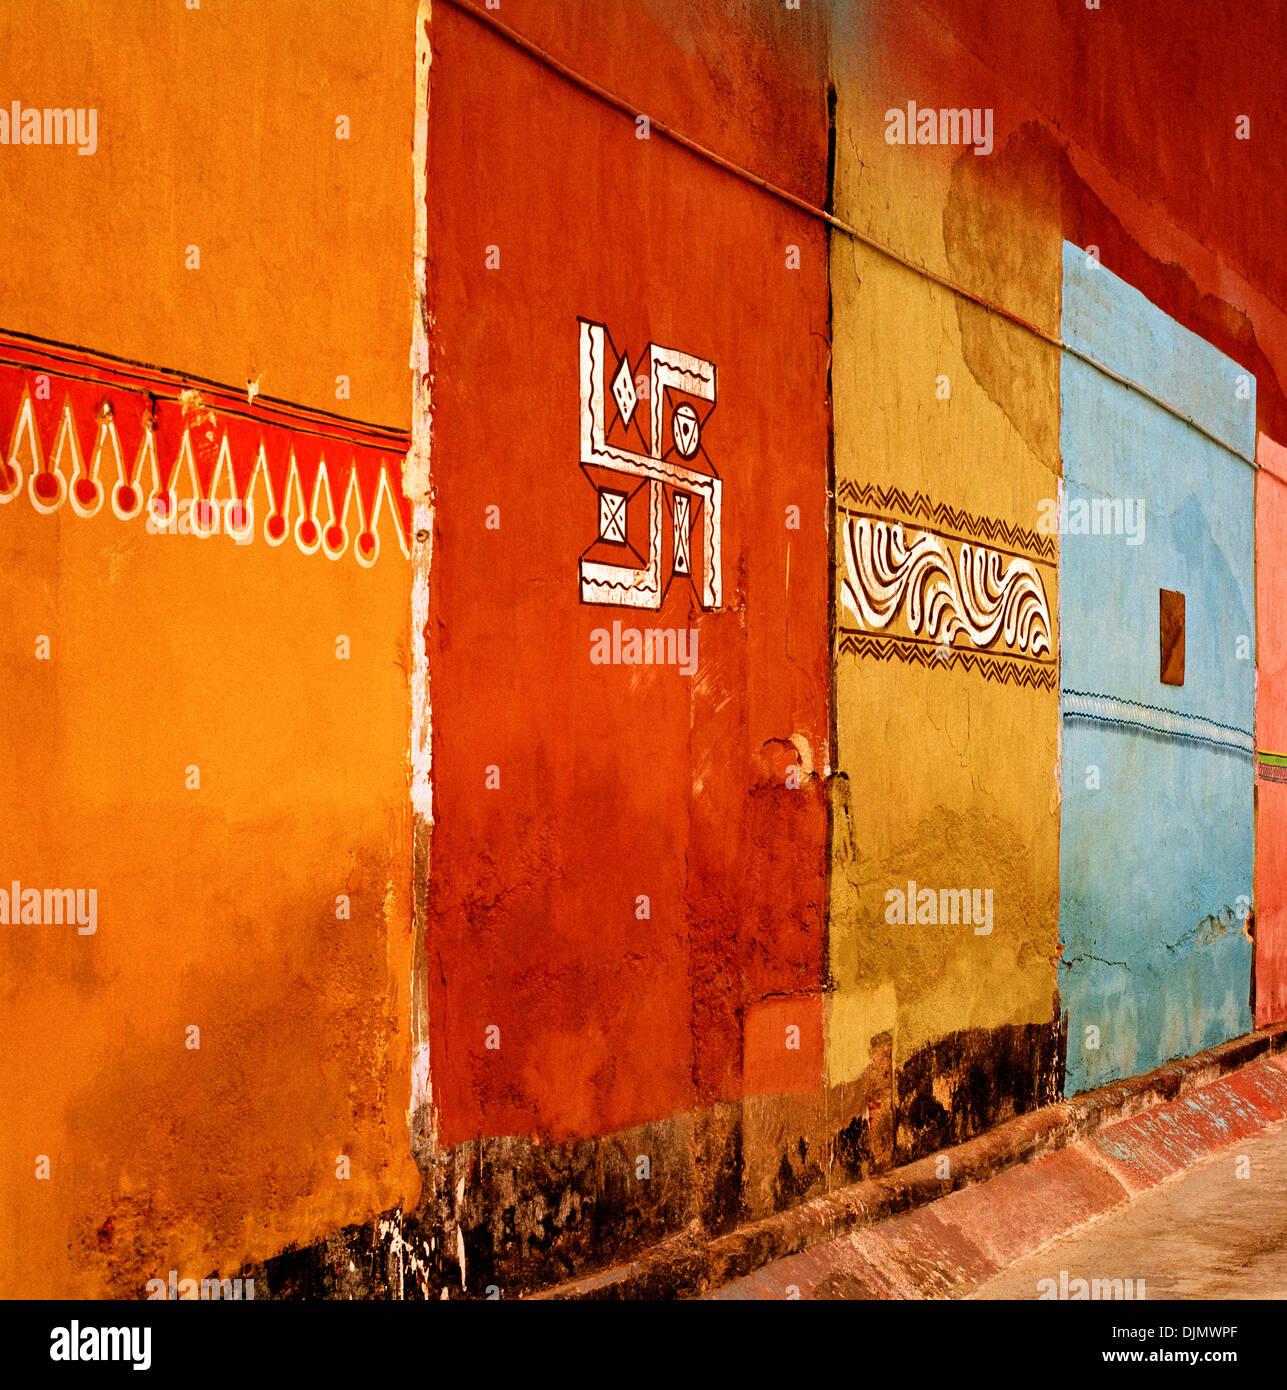 Hinduistische Kunst in Mattancherry Fort Kochi Cochin in Kerala in Südindien in Asien. Religion-religiöse Symbol Symbolik Mughal Moghal Geschichte Beauty Reisen Stockbild